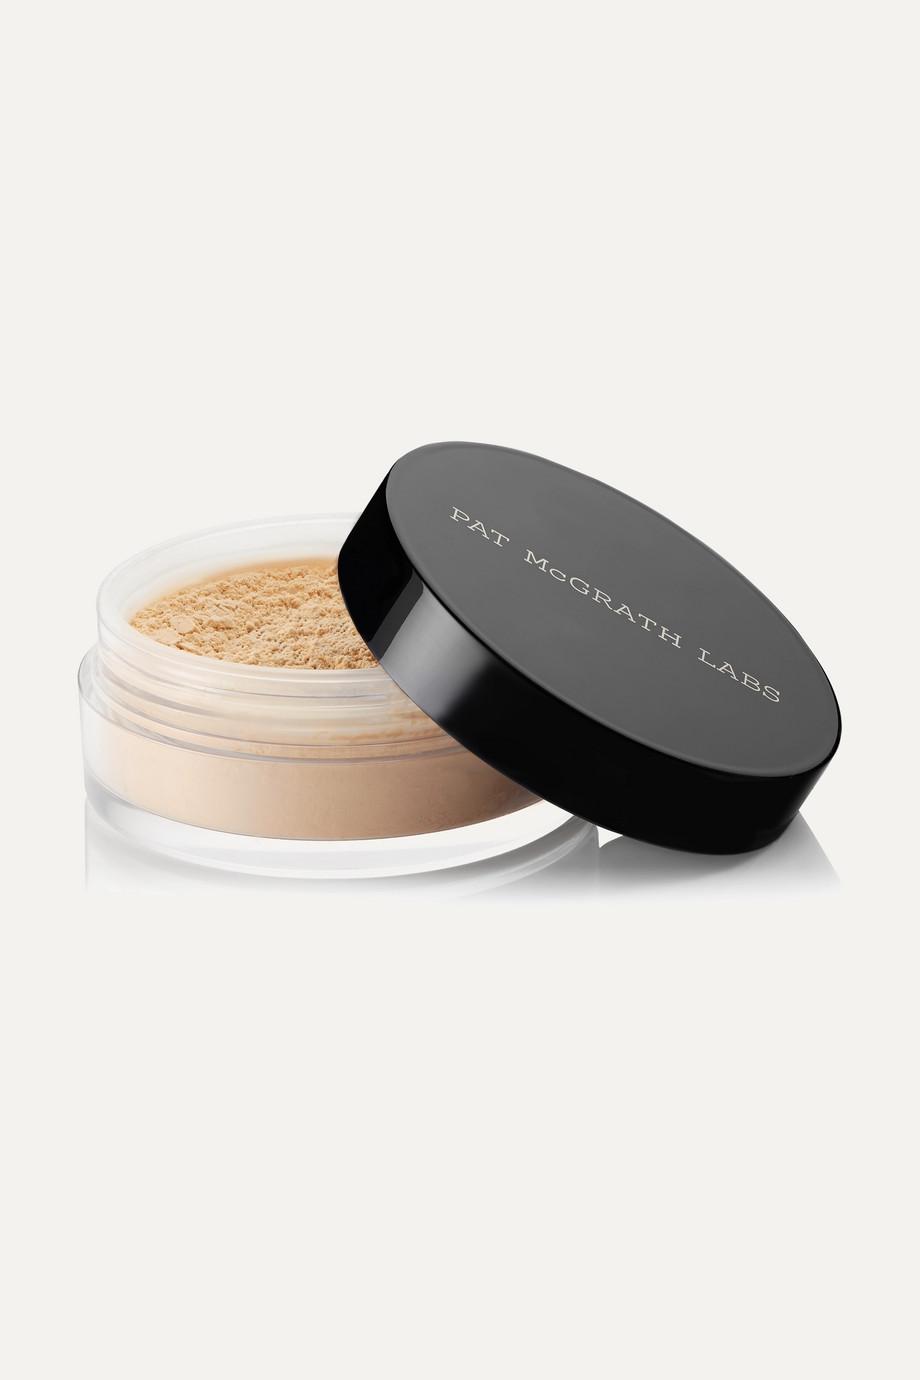 Pat McGrath Labs Skin Fetish: Sublime Perfection Setting Powder - Light Medium 2